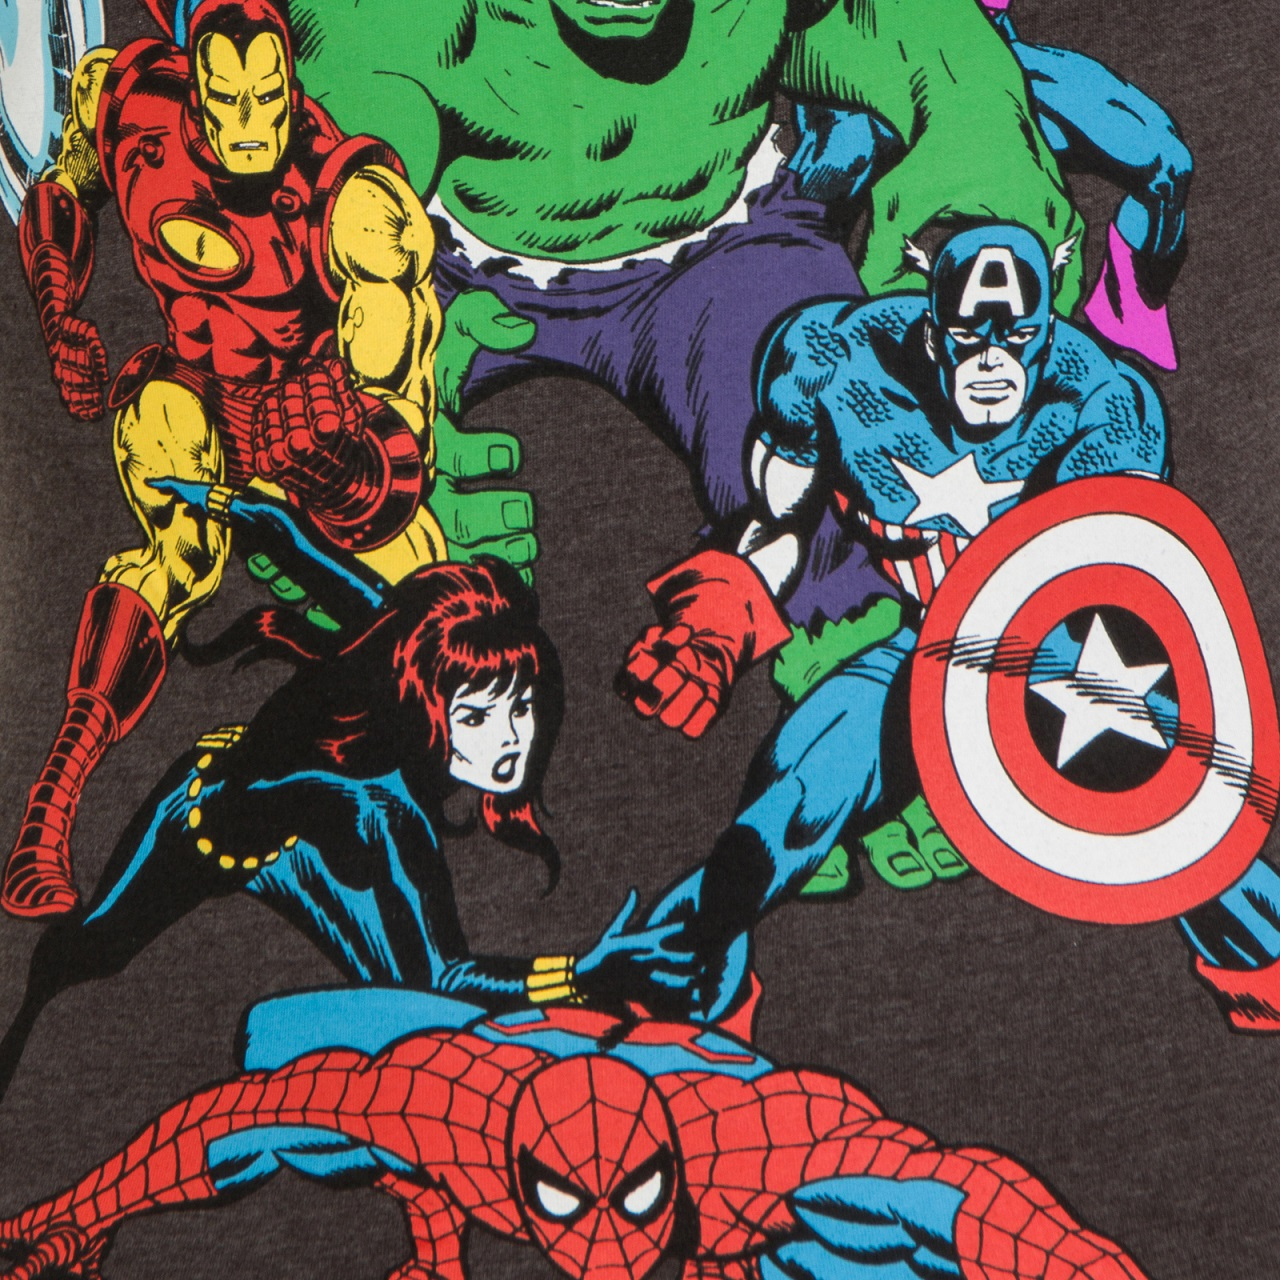 Marvel-Comics-Official-Gift-Boys-Kids-Character-T-Shirt-Hulk-Iron-Man-Thor thumbnail 6